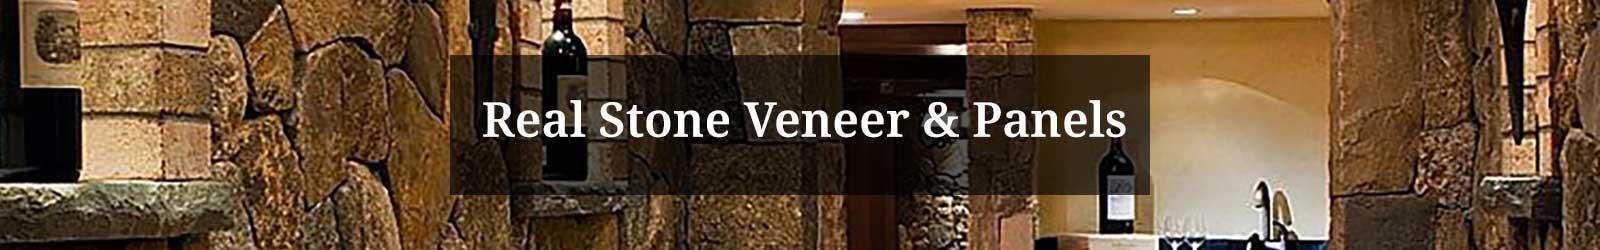 Real Stone Veneer and Panels